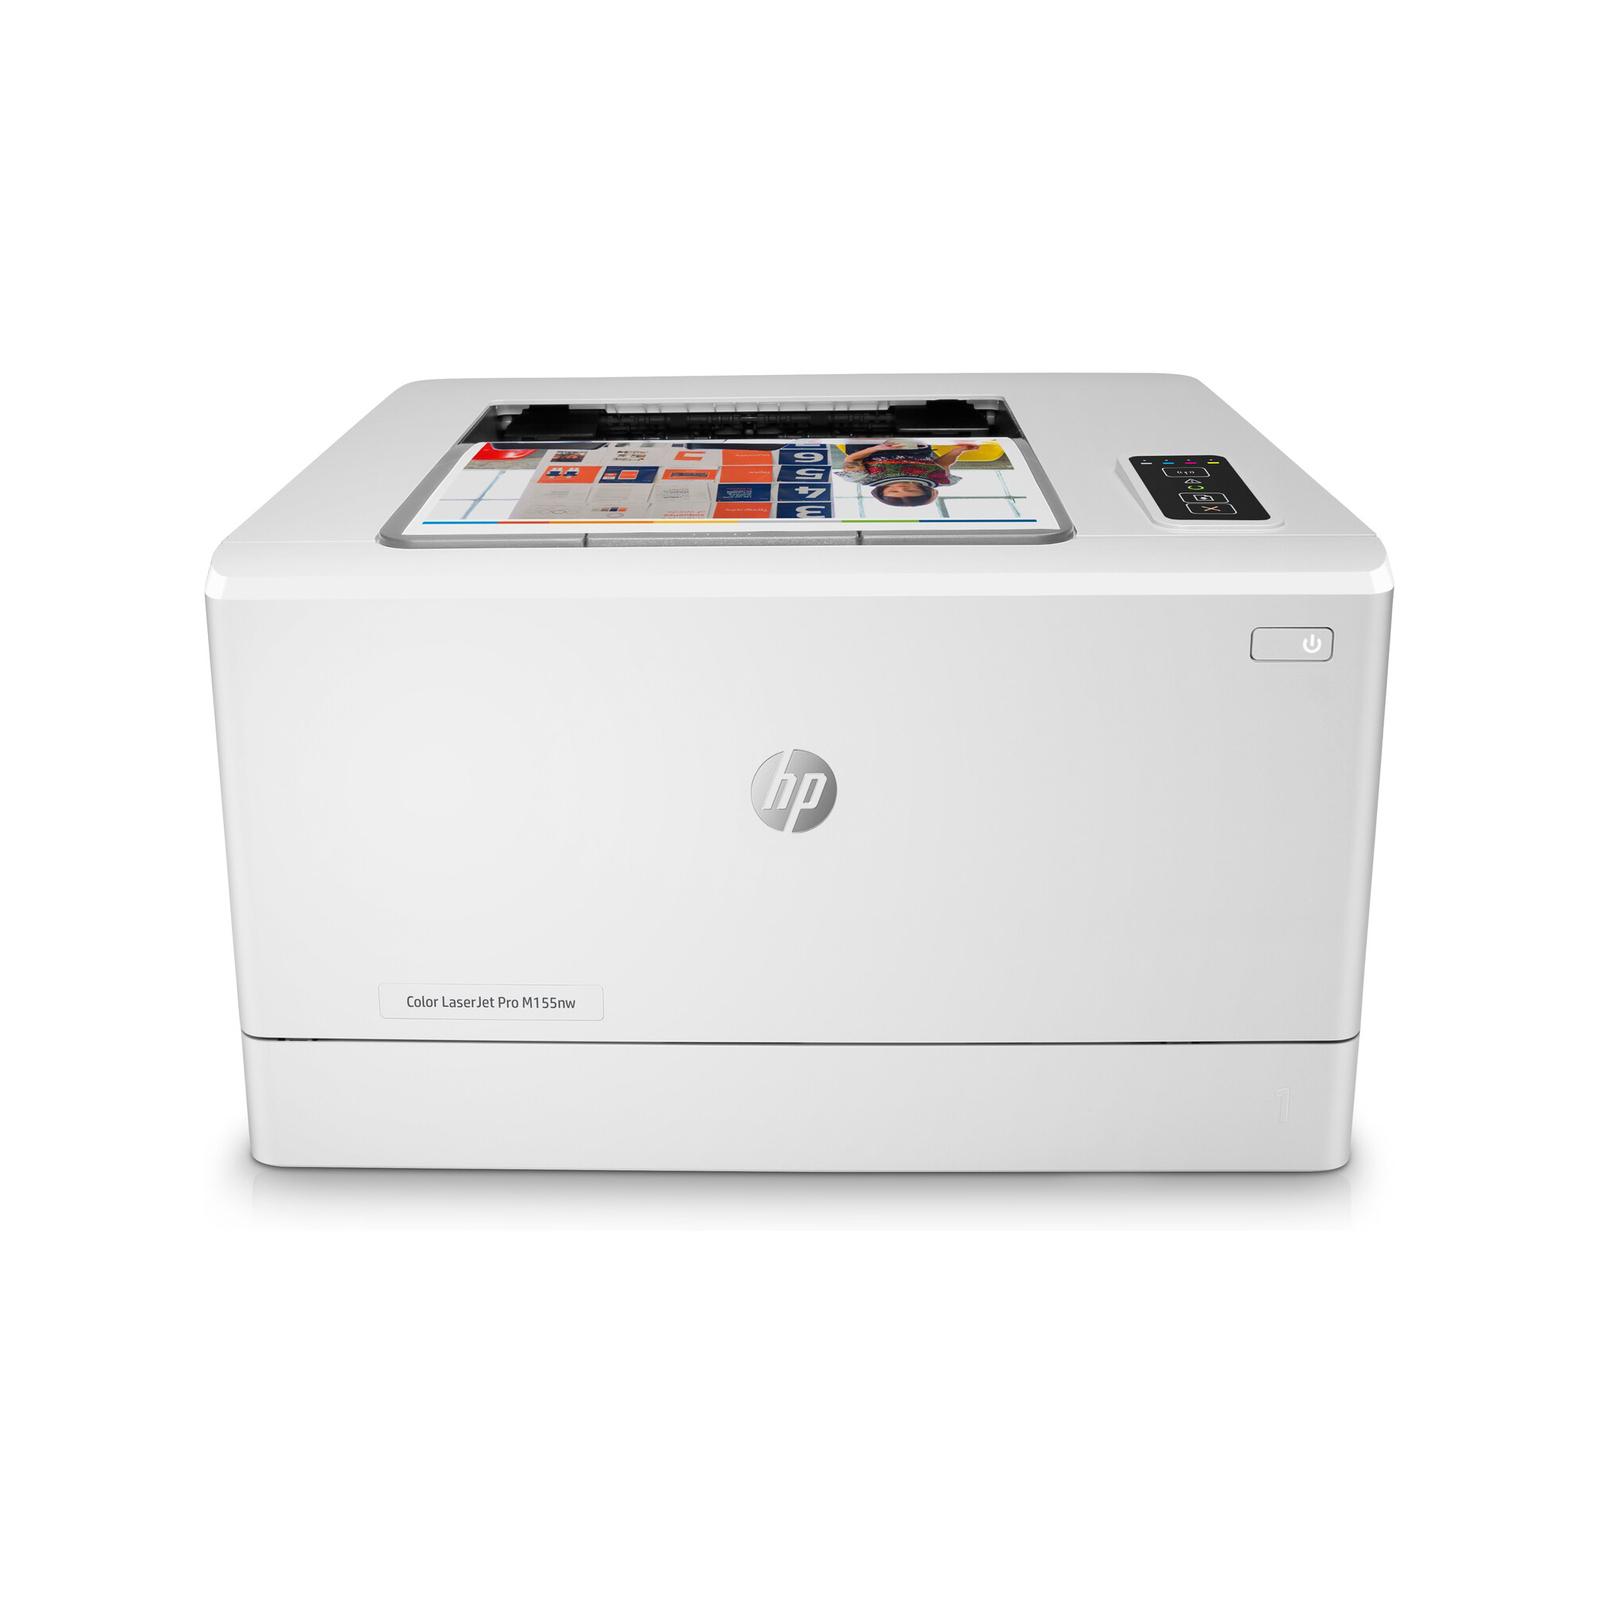 HP Color LaserJet Pro M155nw with 4 Genuine HP Toners- Bundle